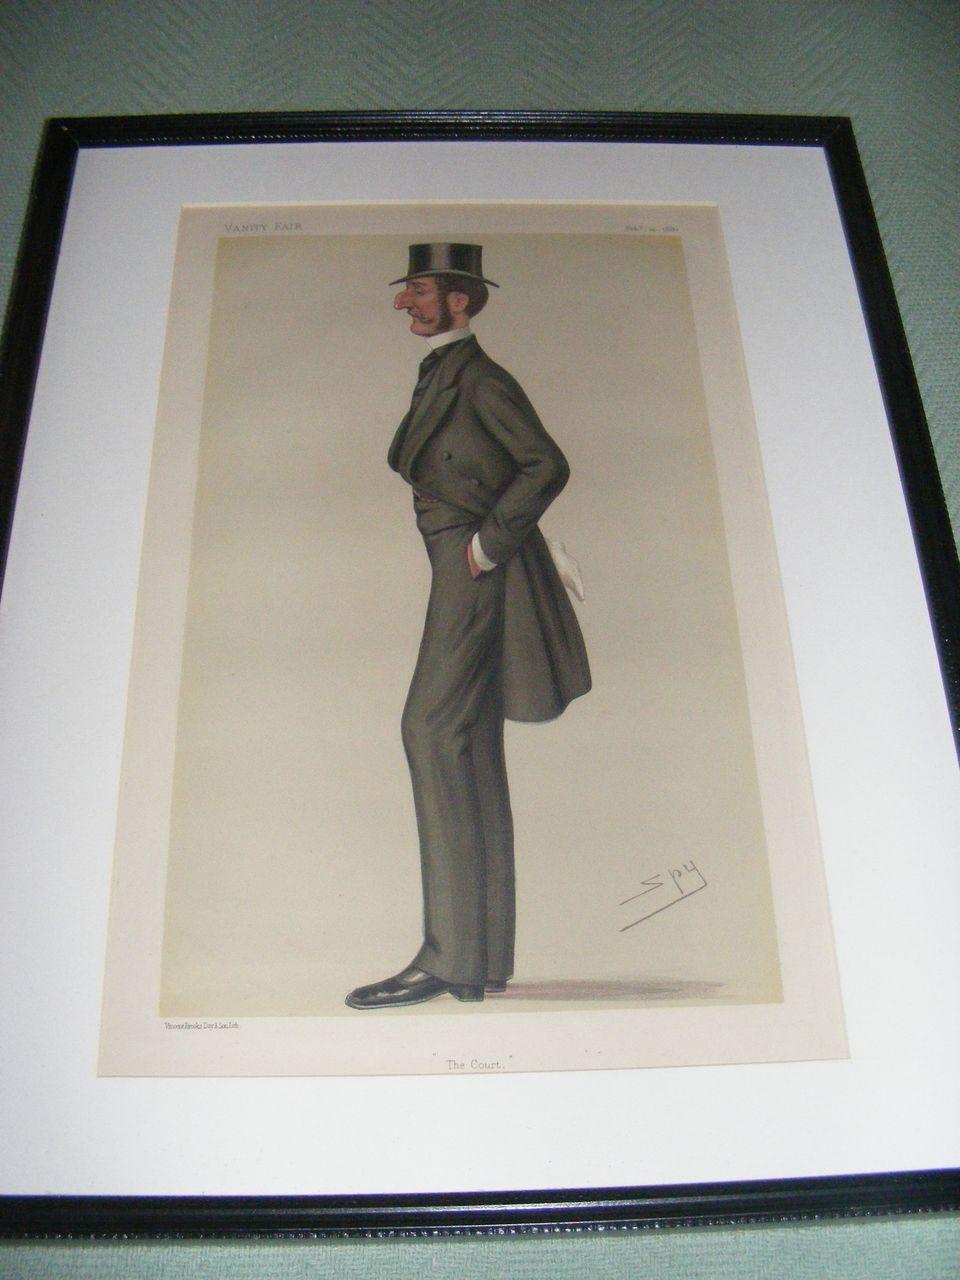 Antique Vanity Fair Print 2-14-1880 Original, Framed & Matted